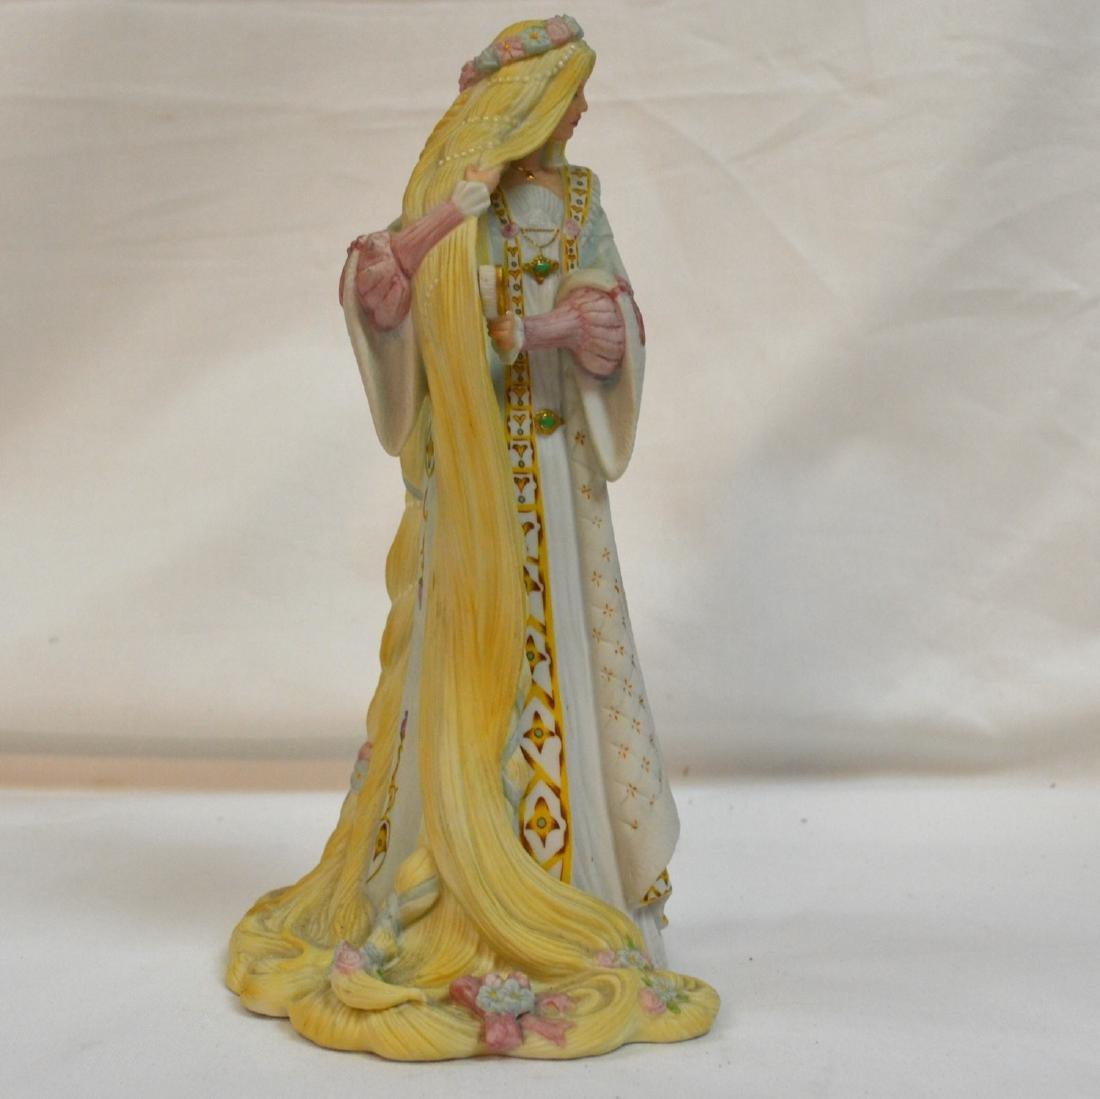 Lenox Legendary Princesses Rapunzel Figurine - 4